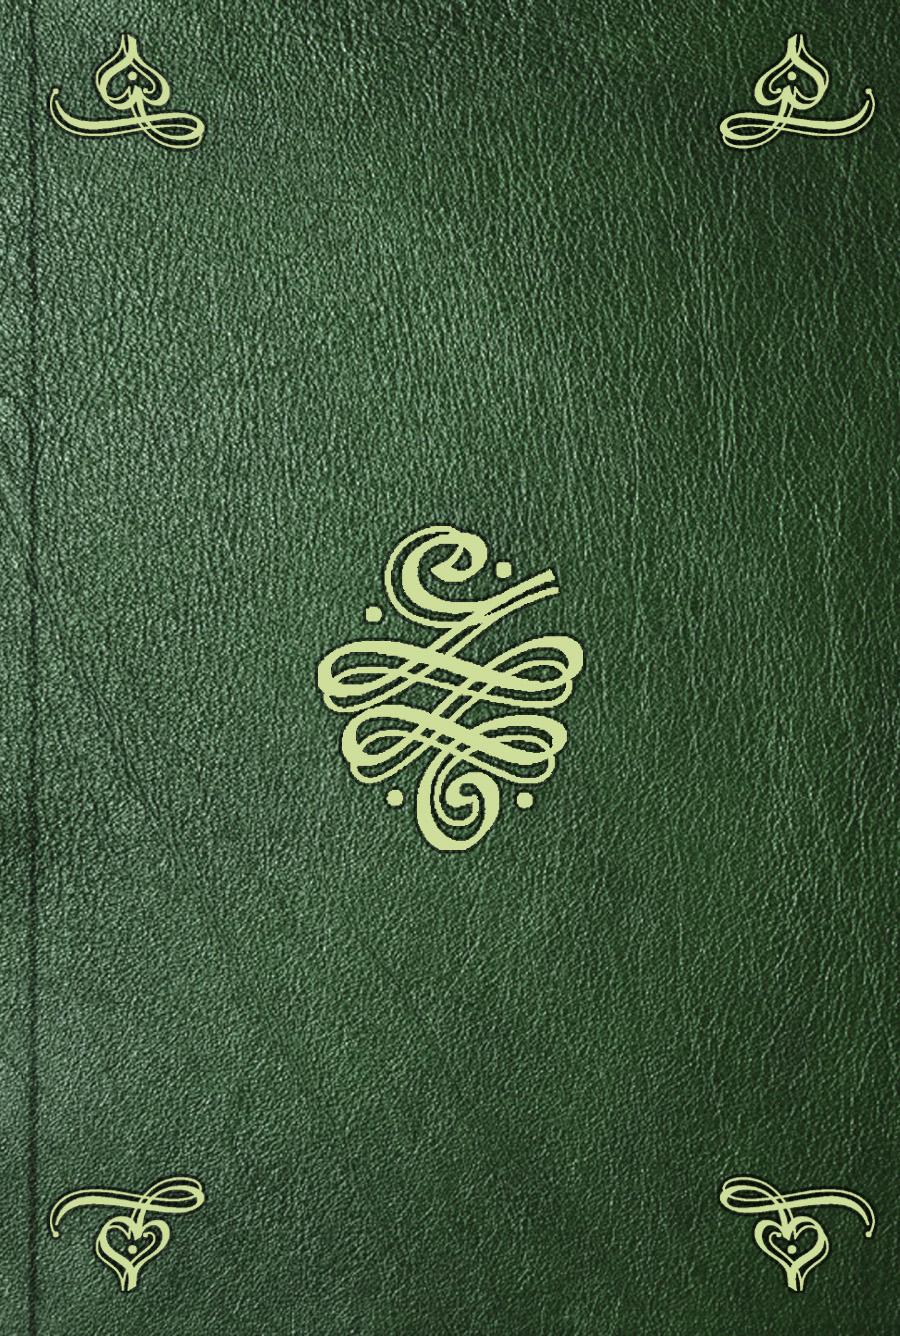 Johann Joachim Winckelmann Lettres familieres. P. 1 hugh blair lectures on rhetoric and belles lettres vol 1